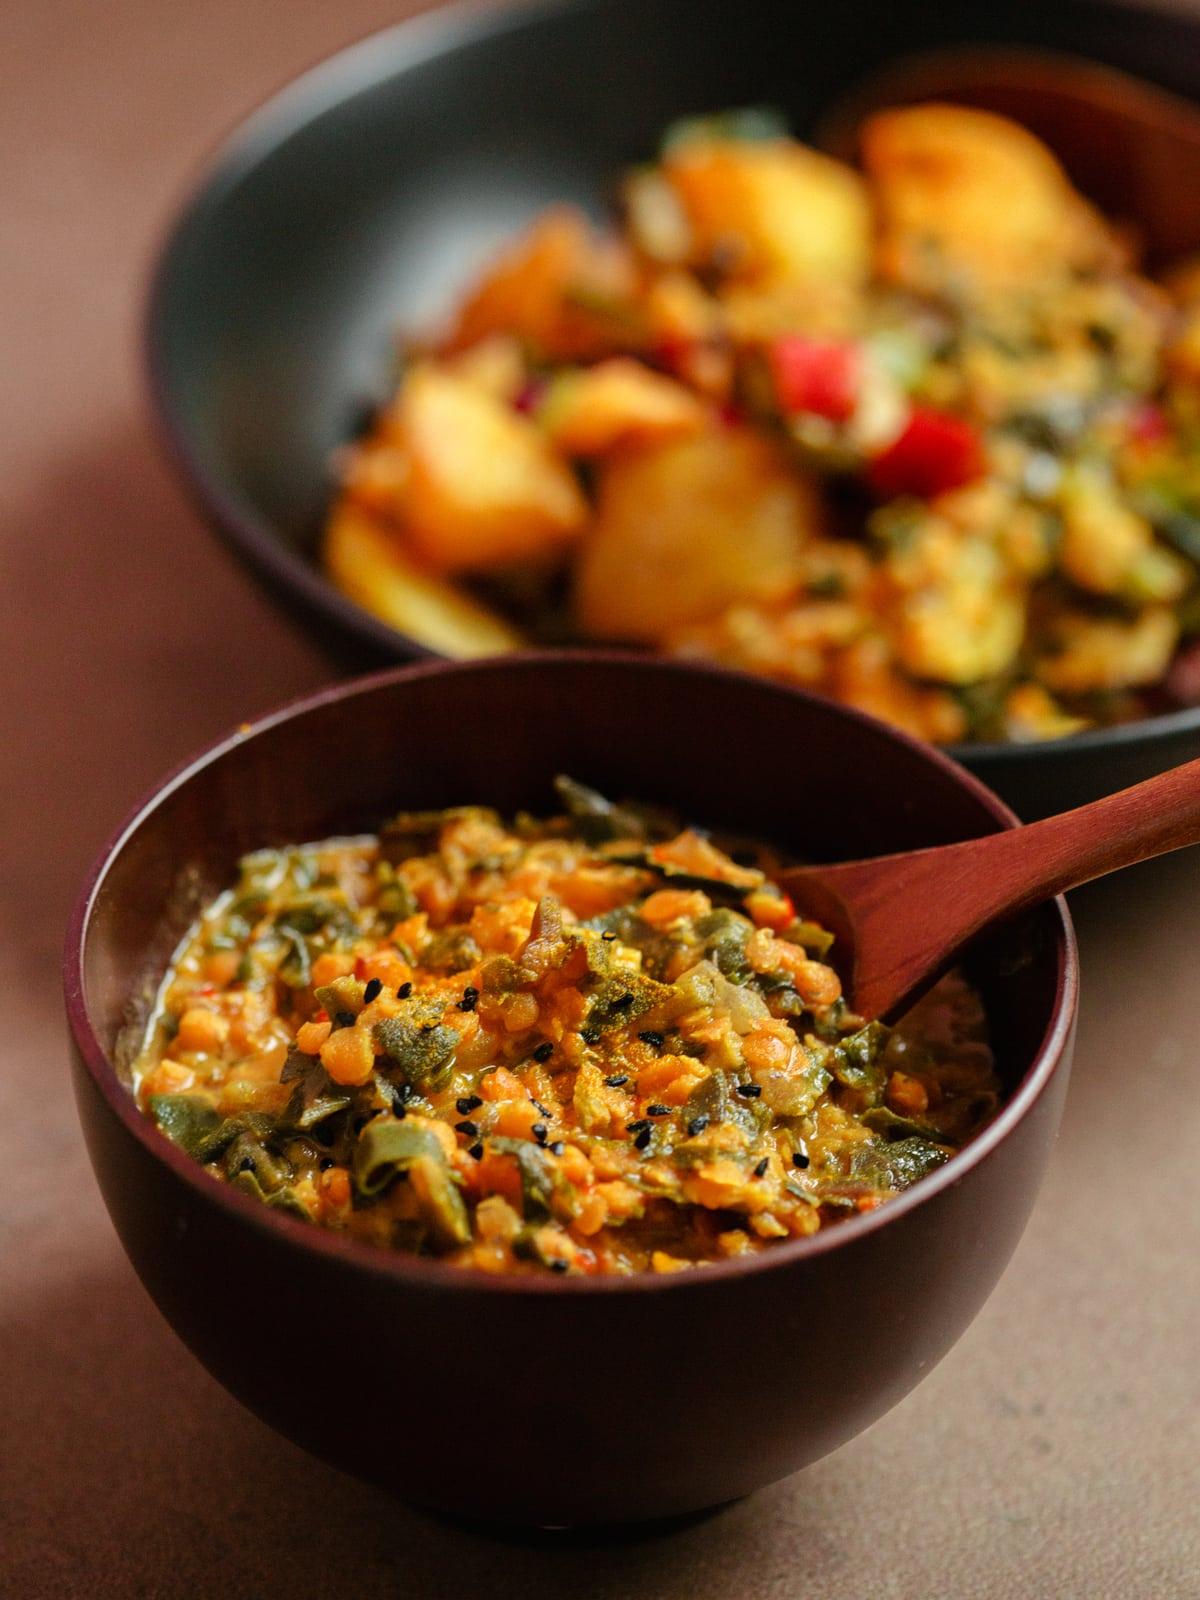 mangold linsen curry second day pimped mit kartoffeln